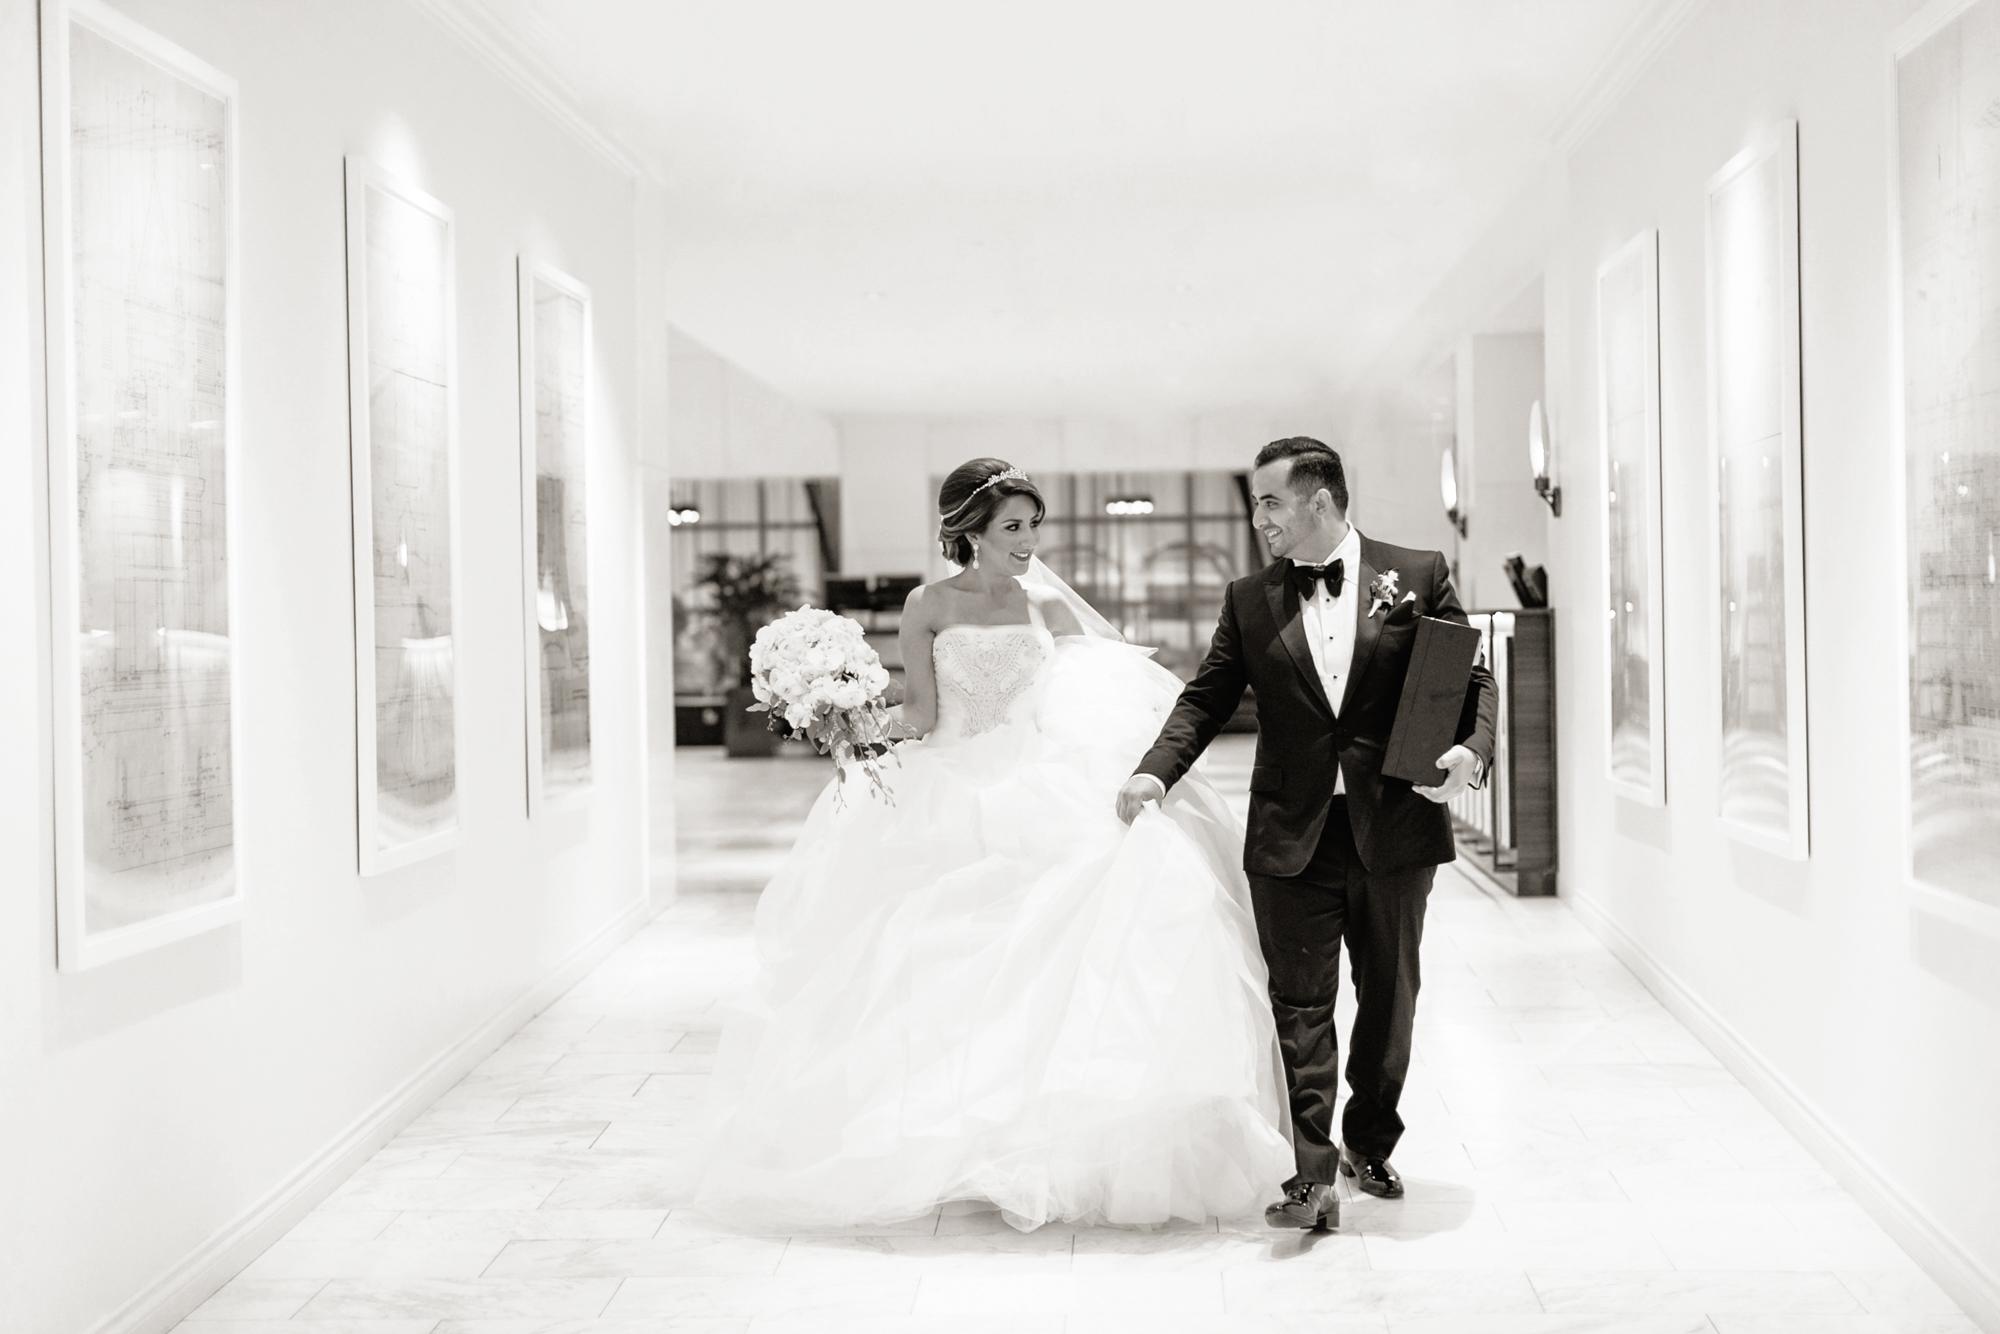 vancouver-luxury-wedding-photographer-lori-miles--19.jpg